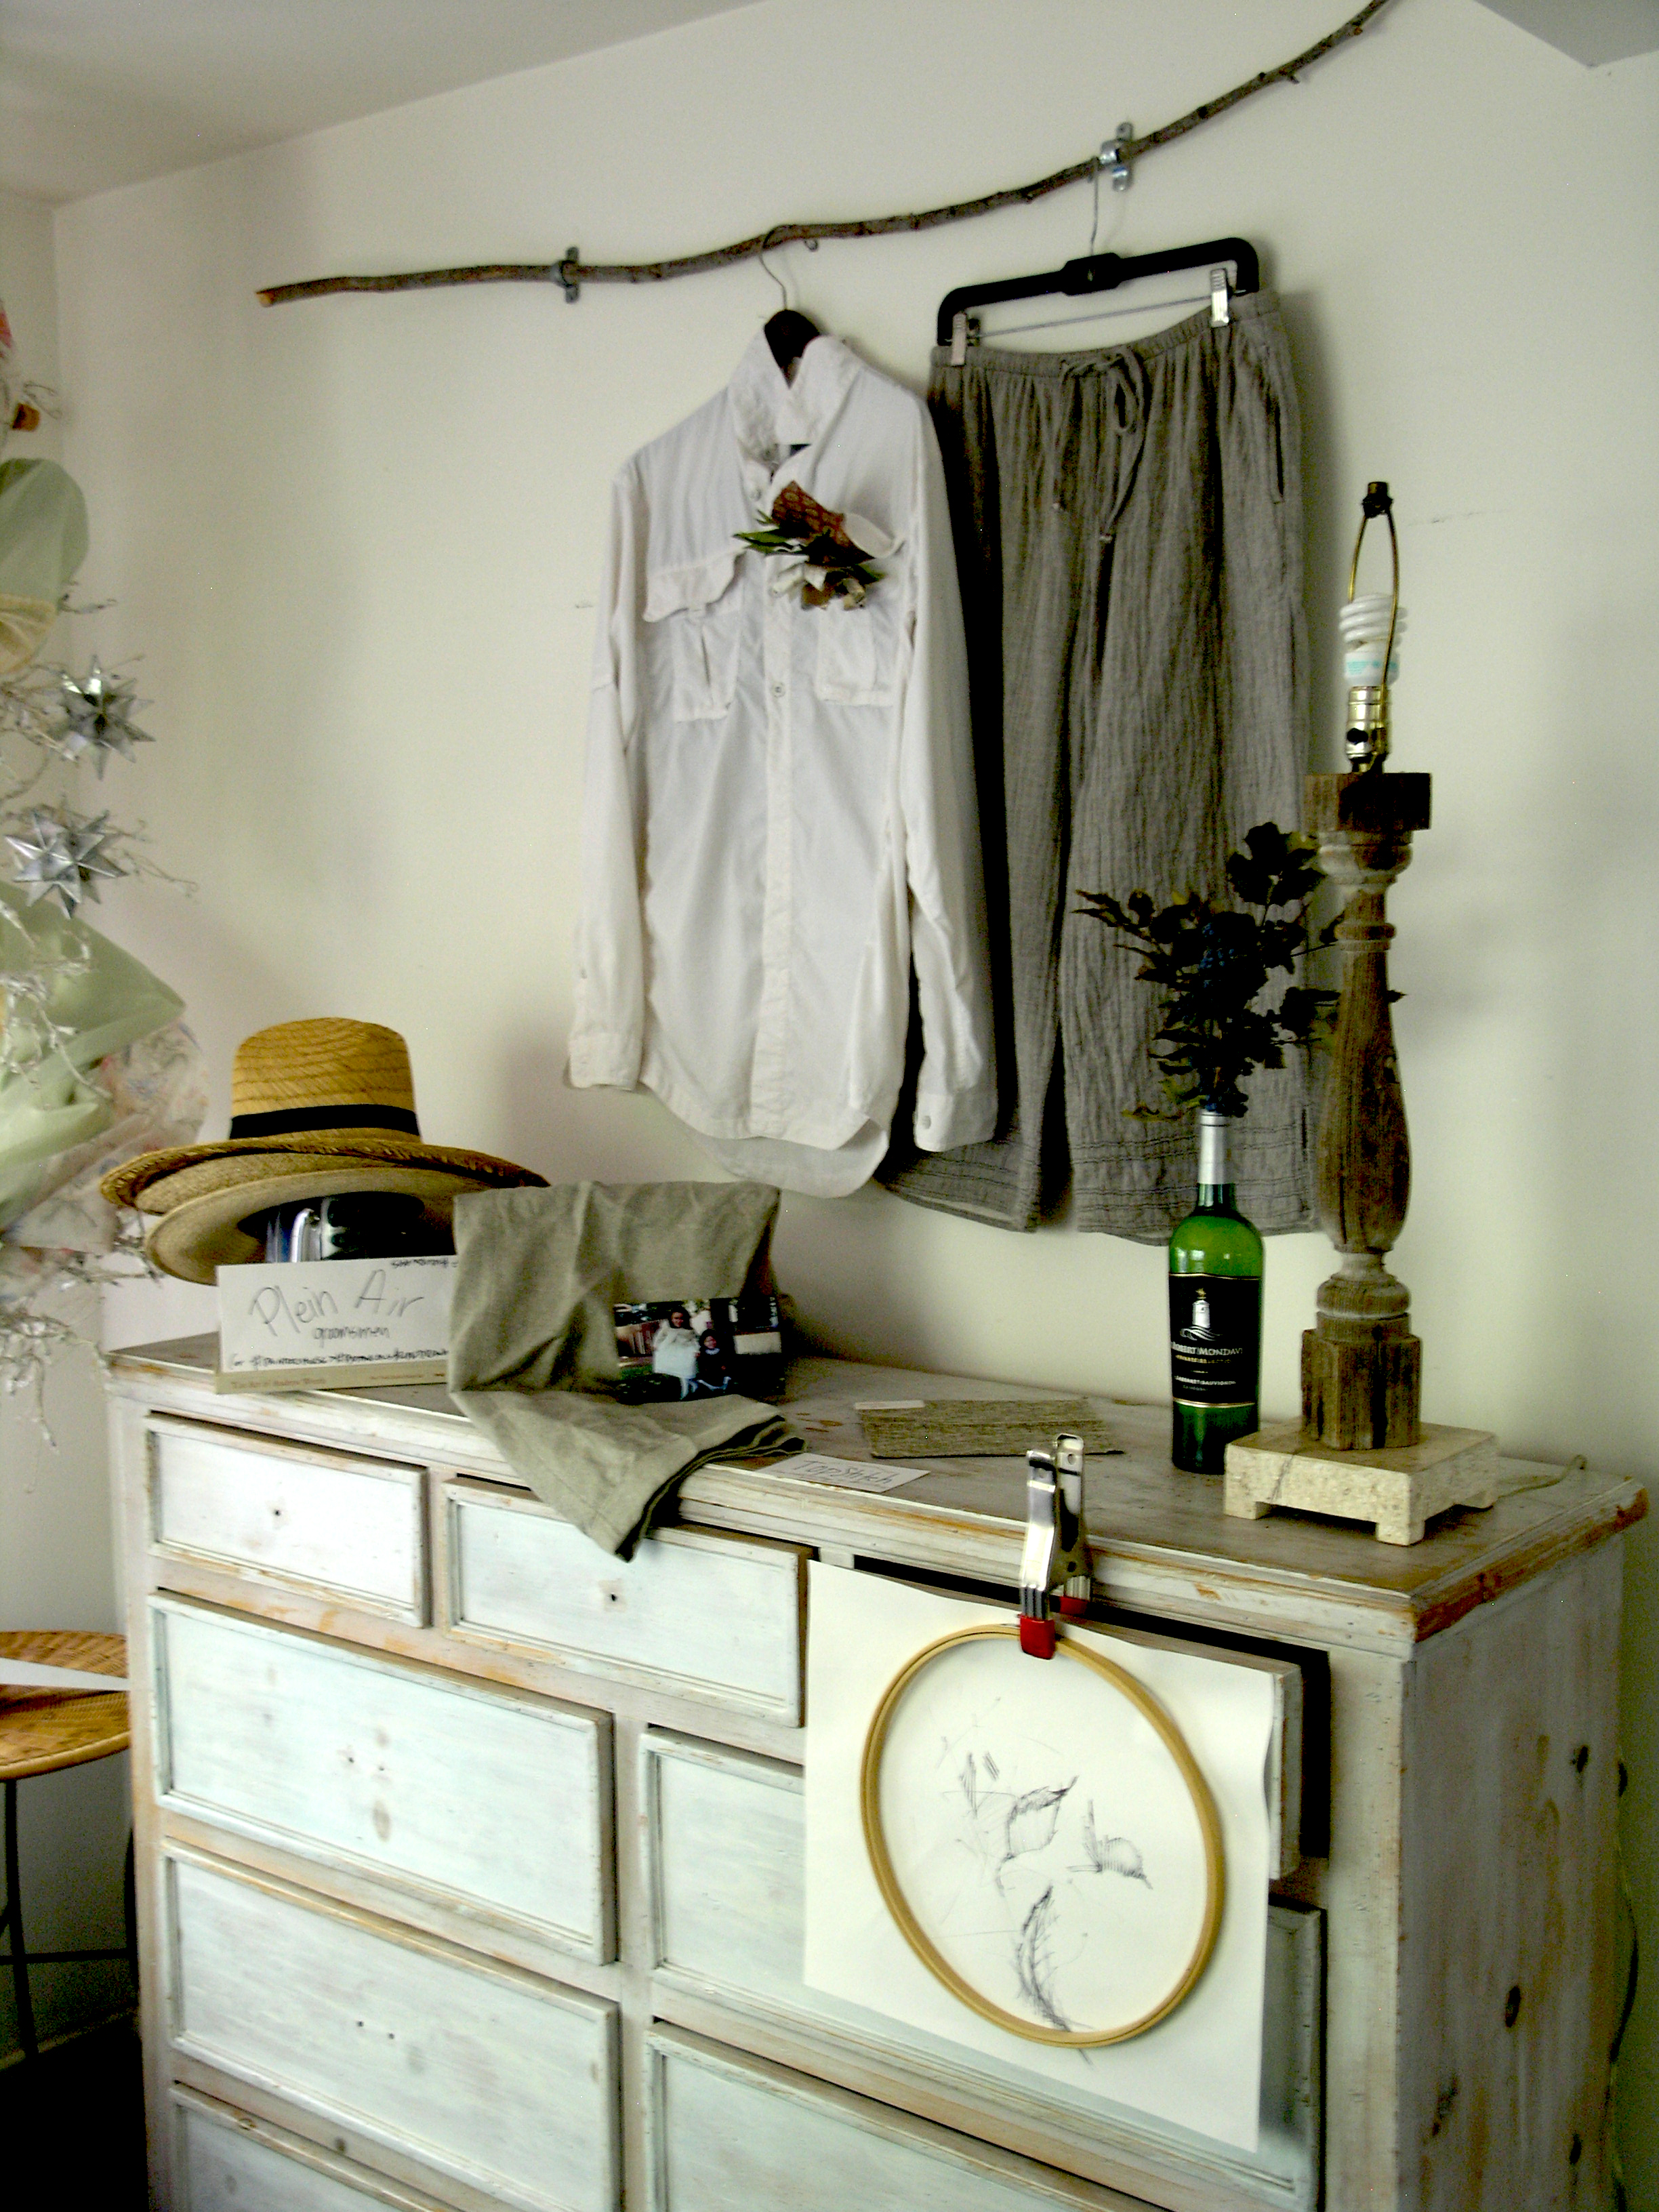 #PleinAir #Groomsmen & #PaintersHouse #WeddingChapel #Studio setup, including local #Botanicals #sketch for embroideries. Love is in the Plein Air for #PinupsPresidential...